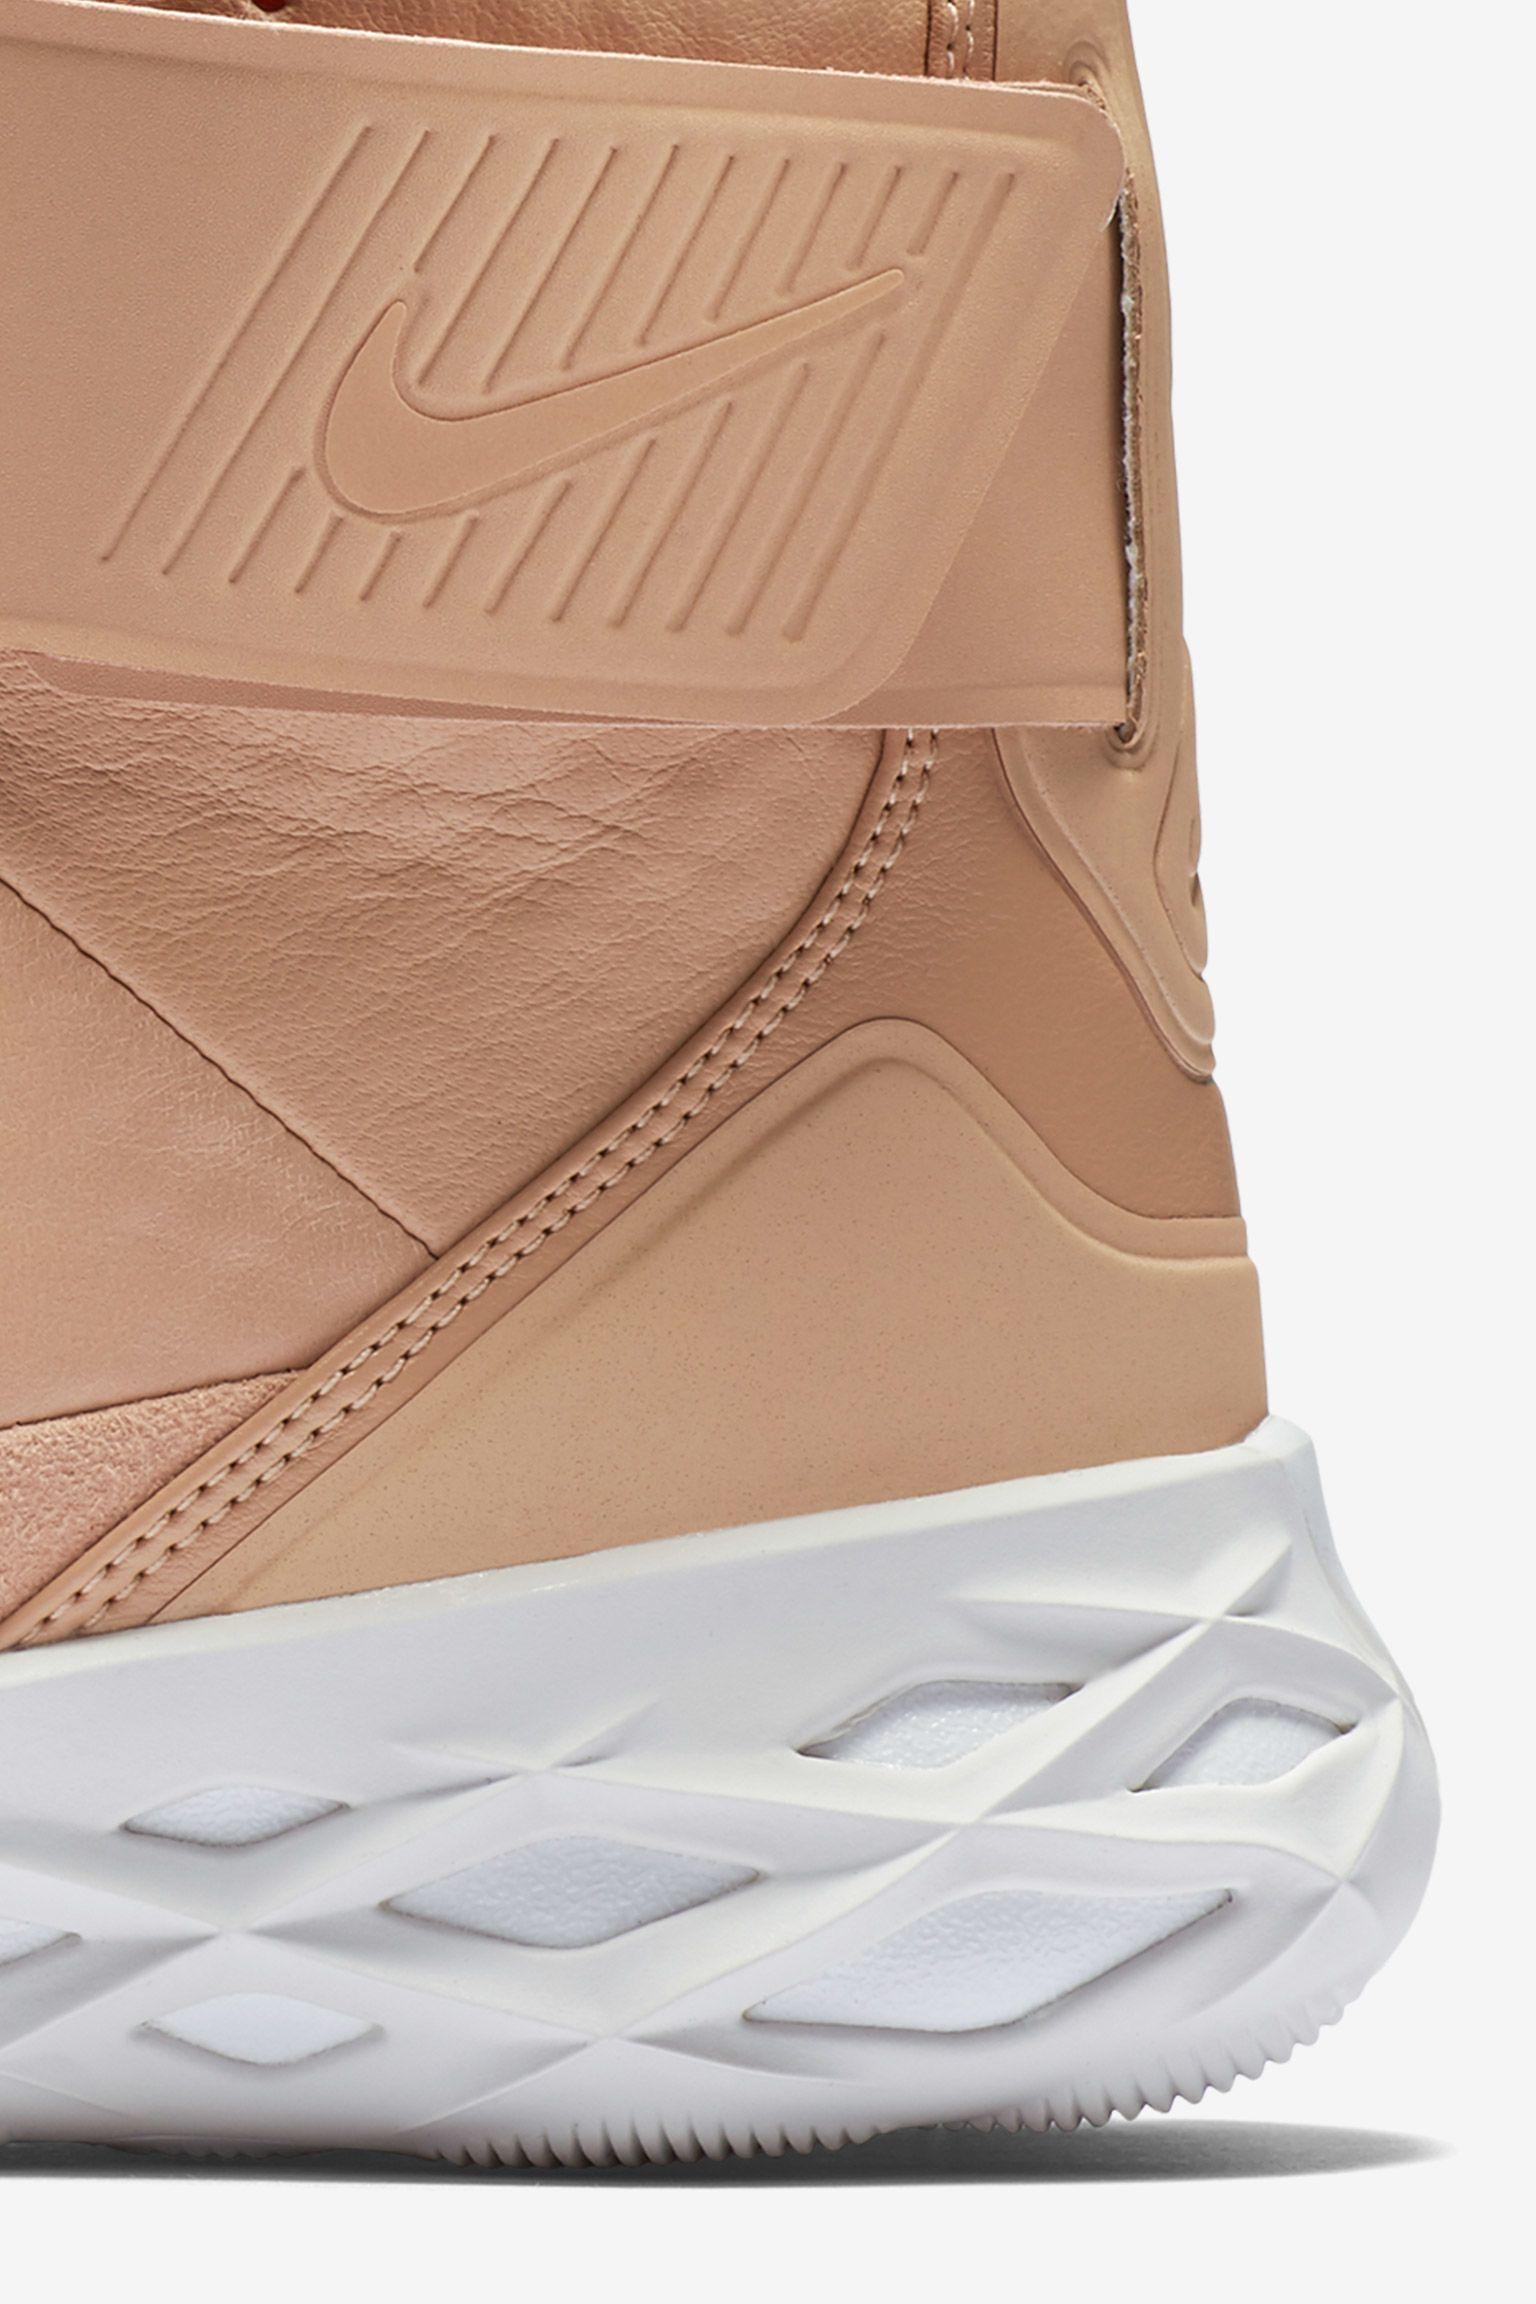 6a2c574df65 Nike Swoosh HNTR  On The Hunt  Vachetta Tan. Nike+ SNKRS